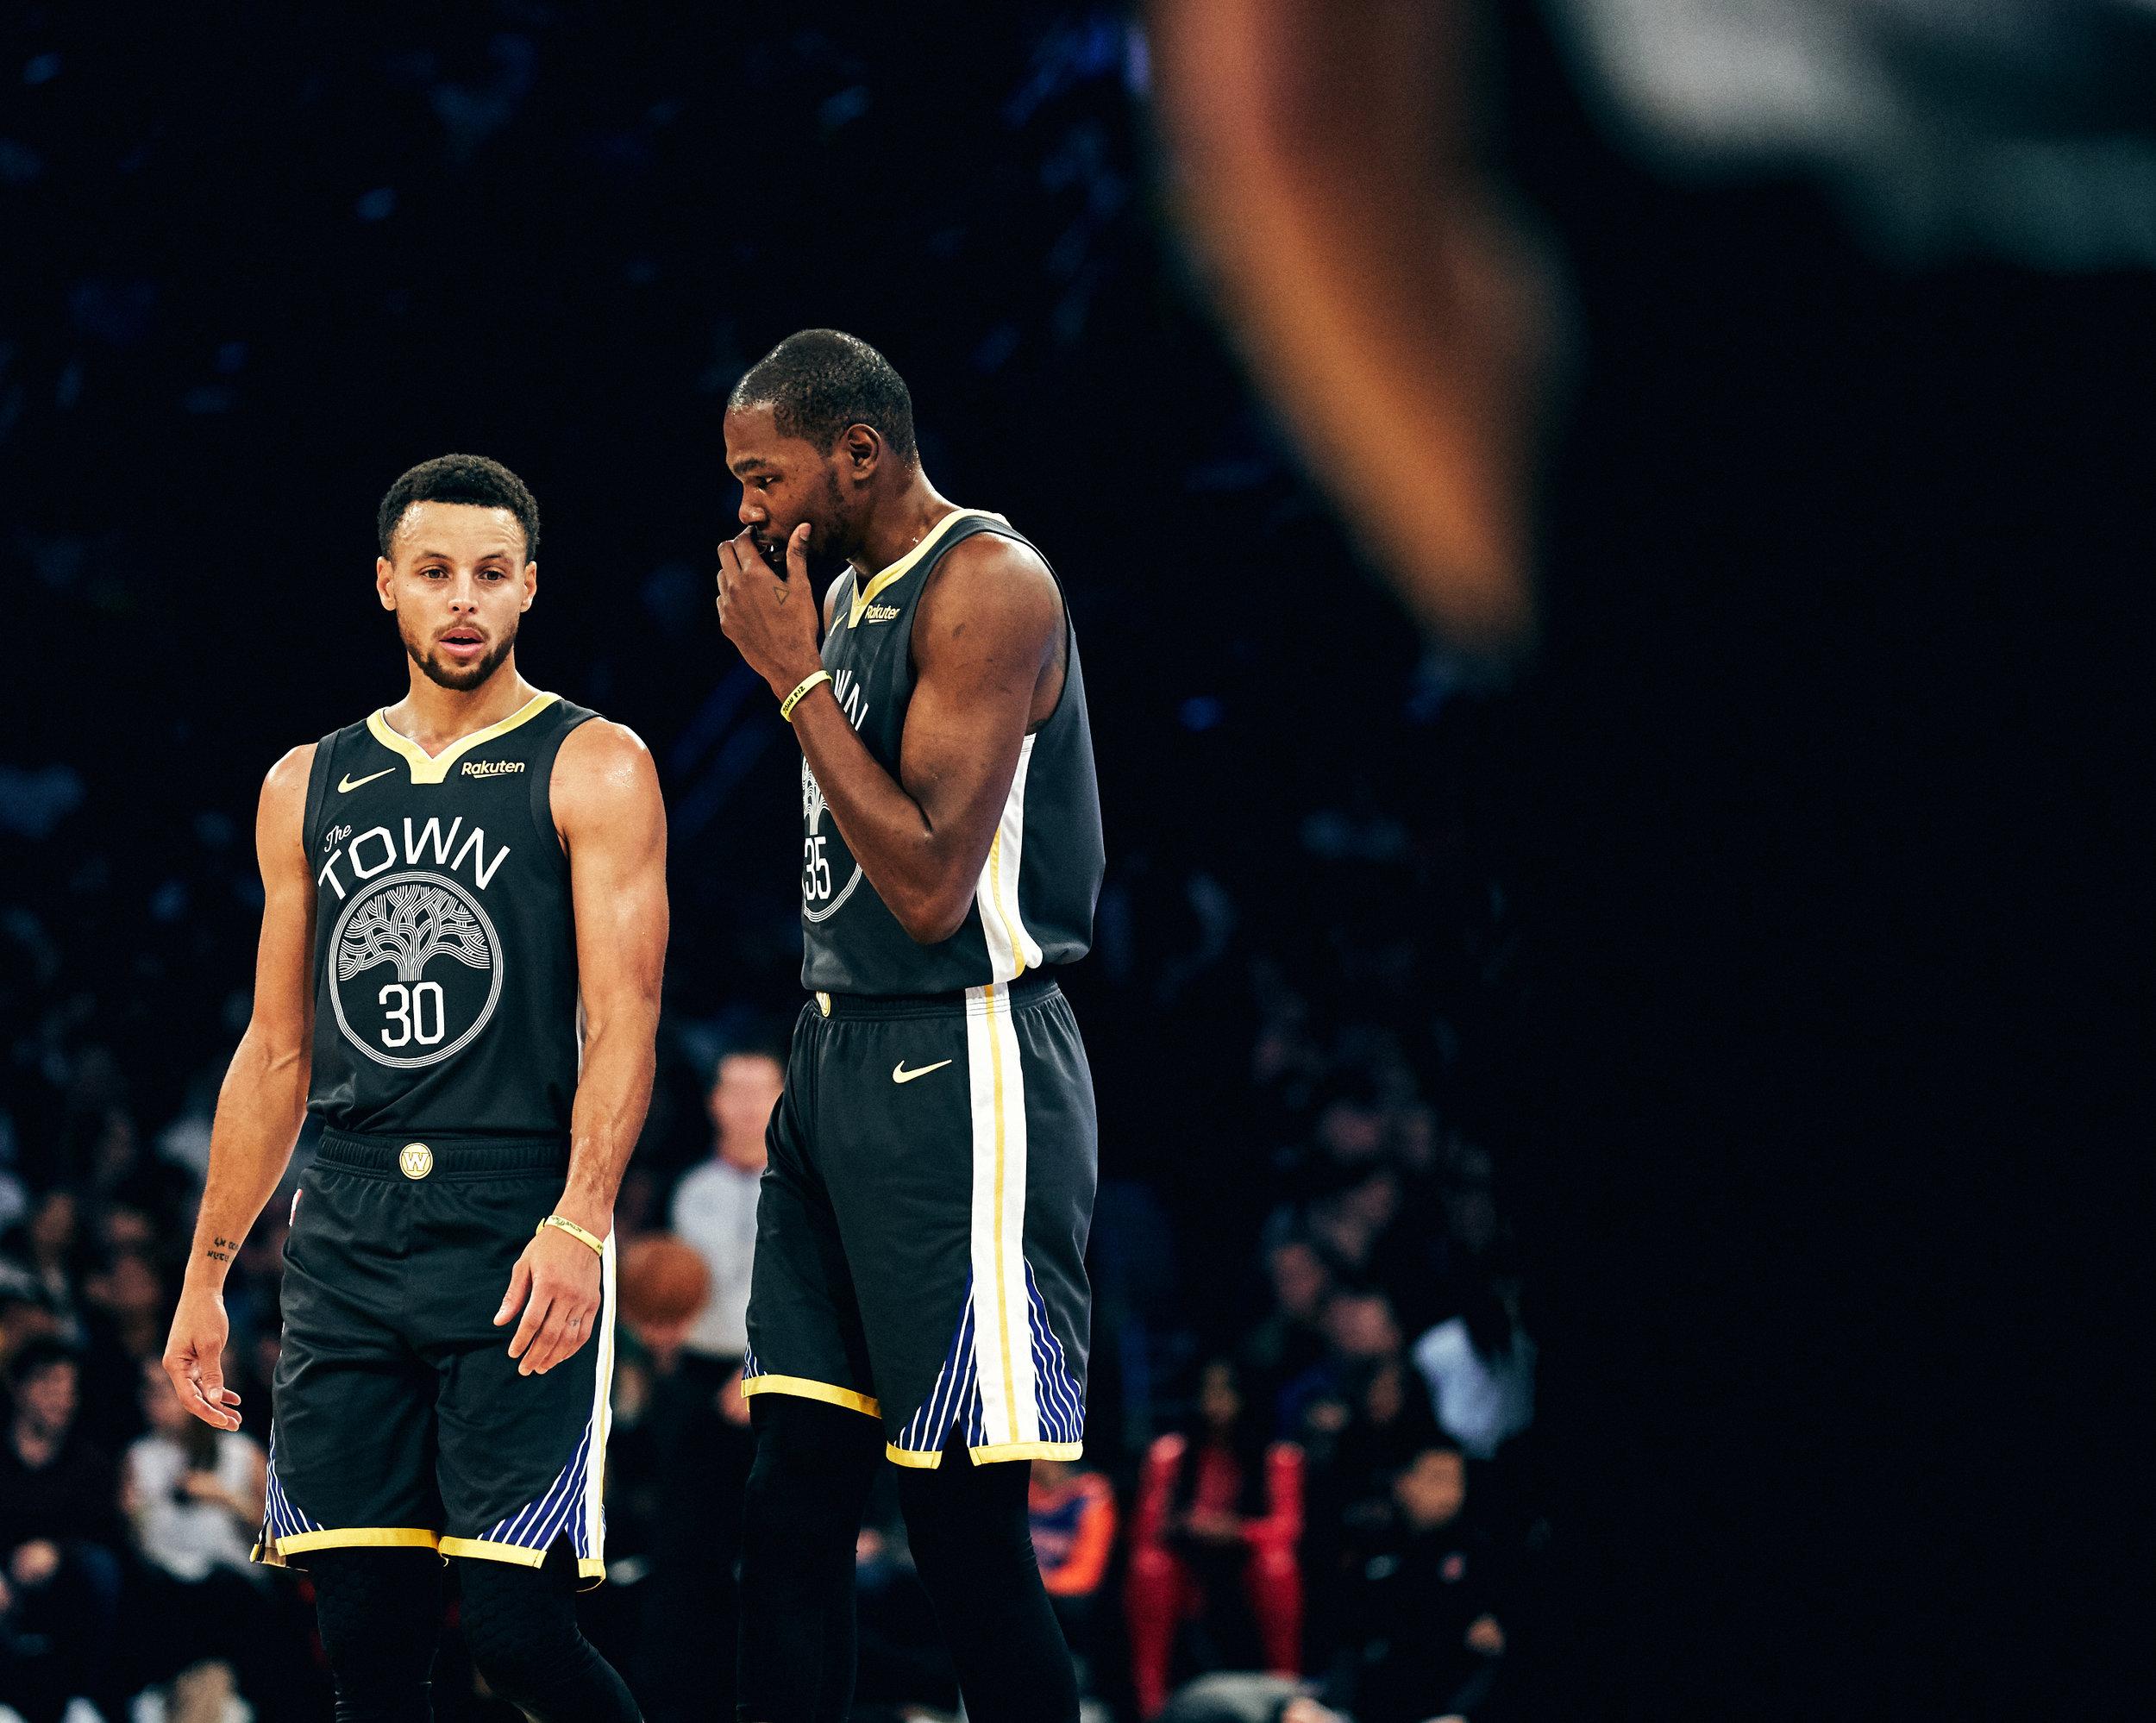 Golden State Warrors vs New York Knicks - October 26, 2018